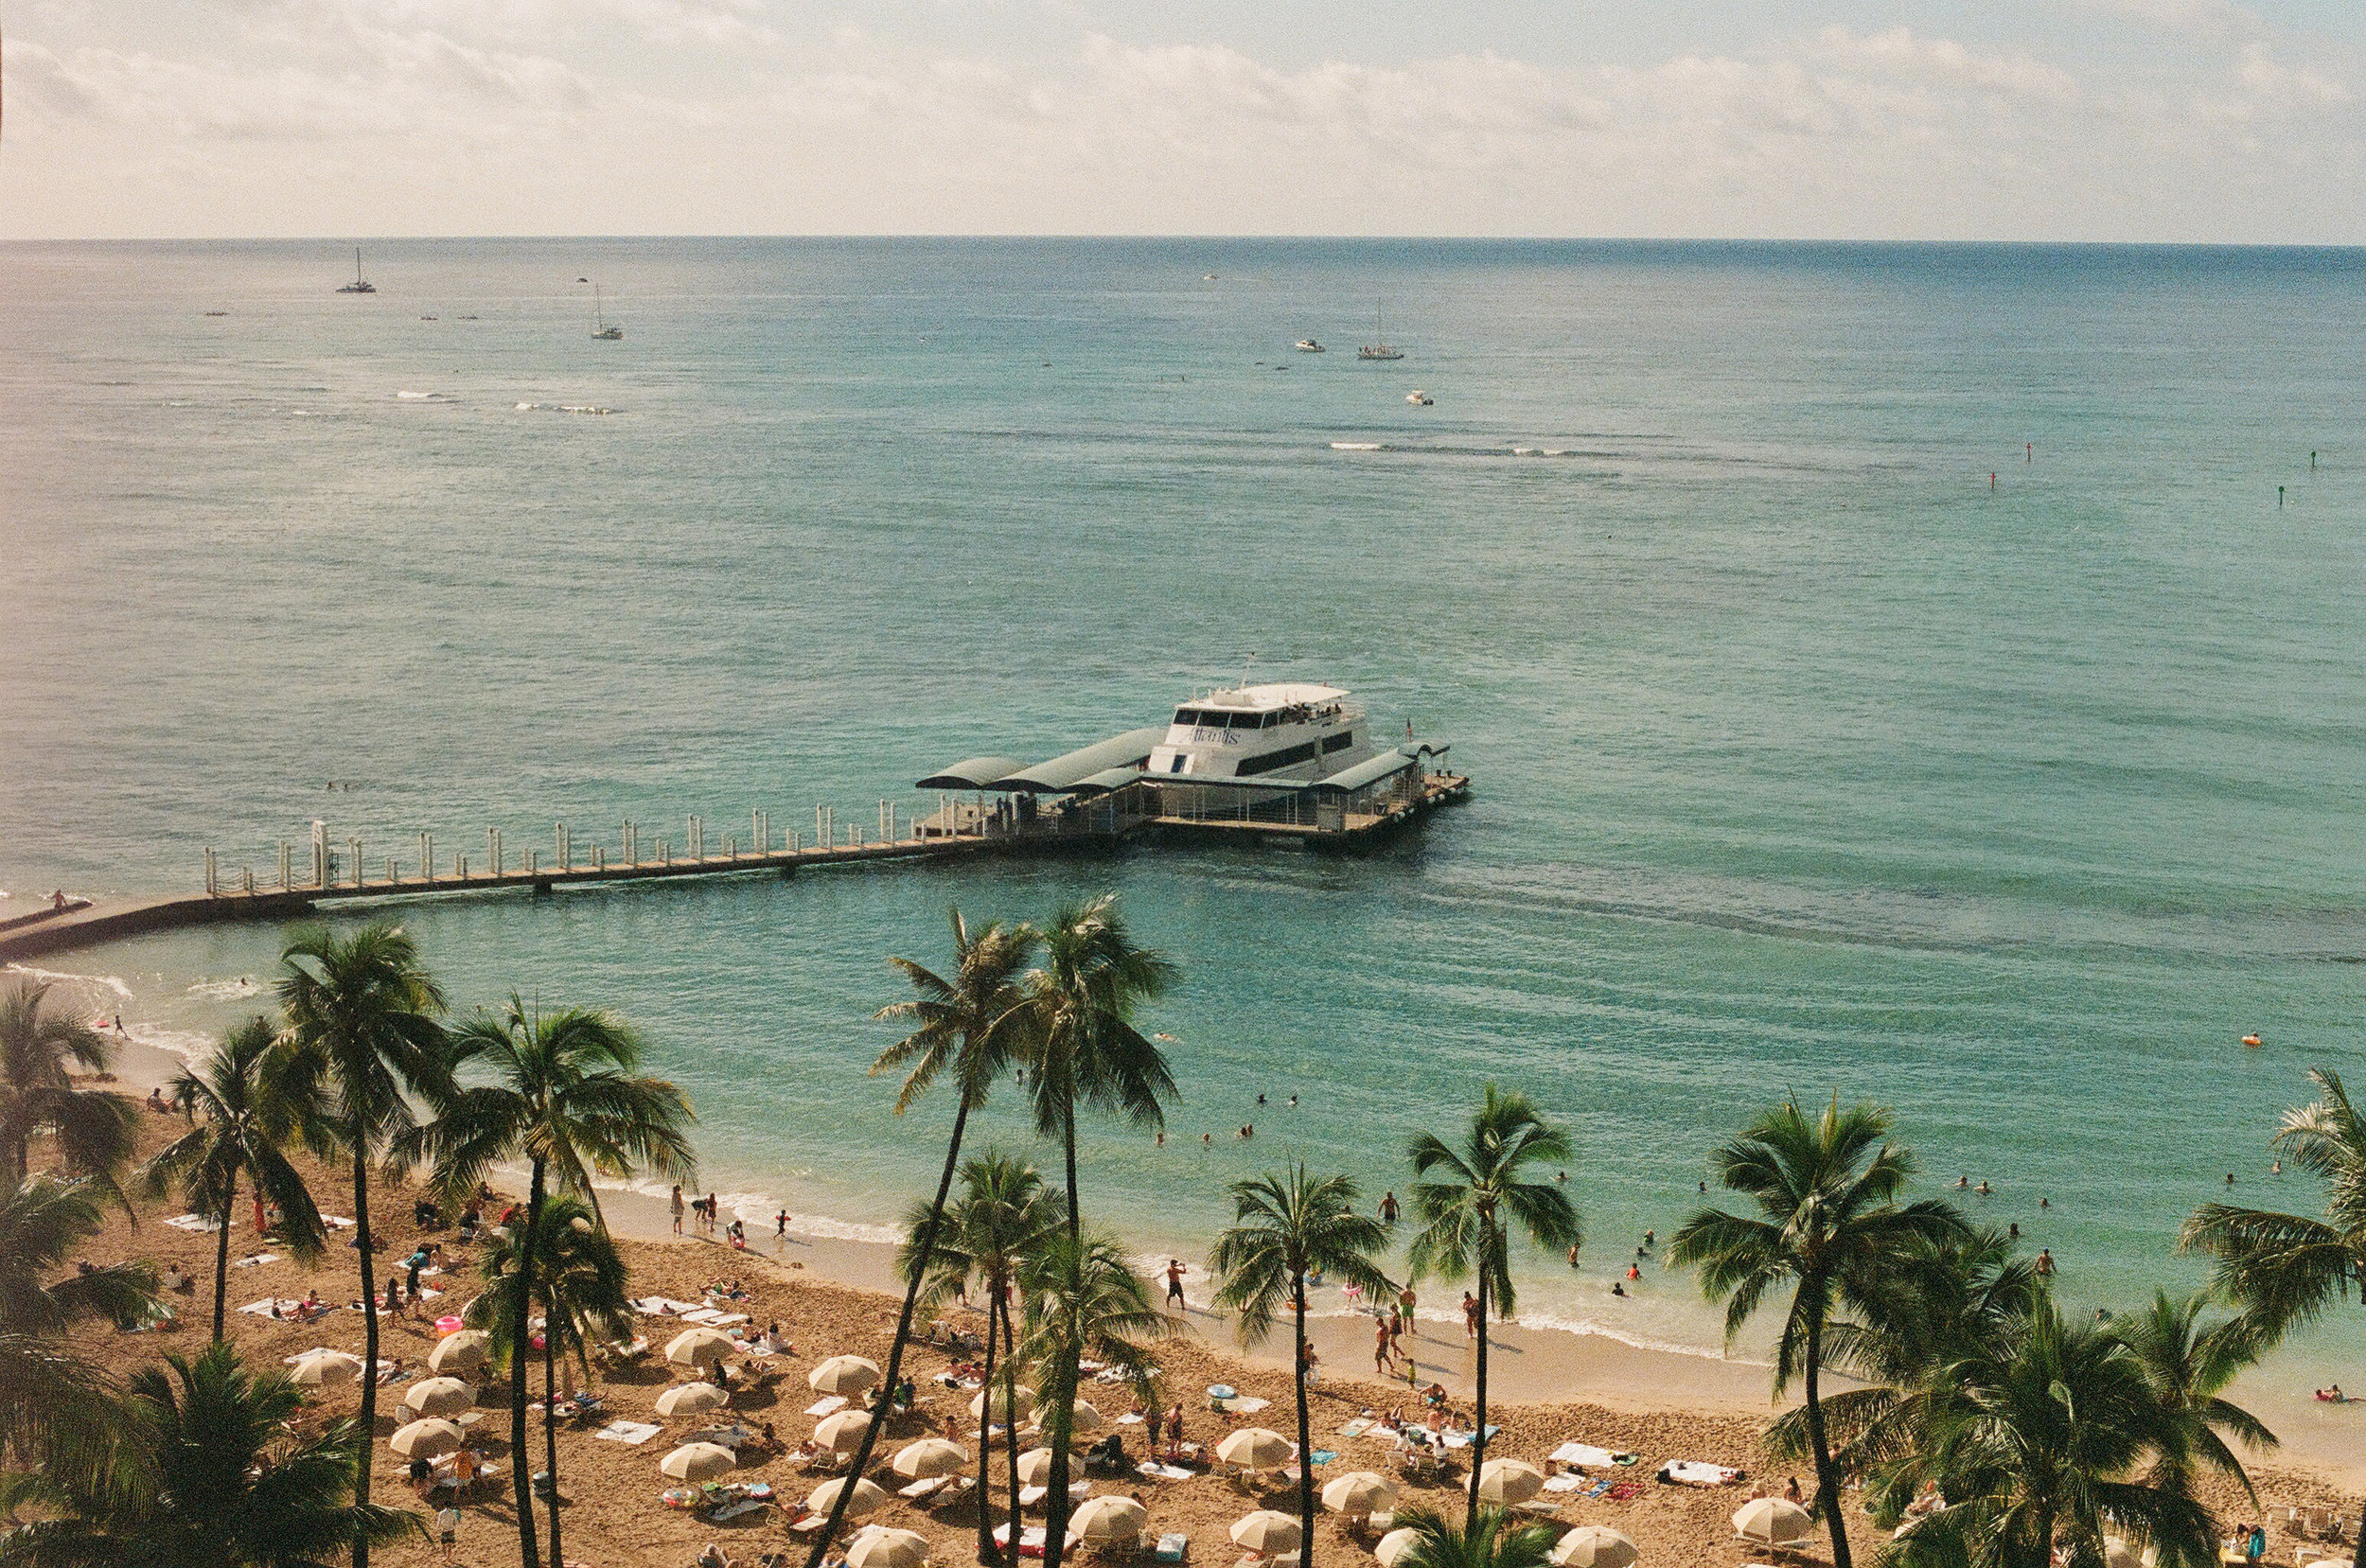 hawaii05filmwebsite.jpg